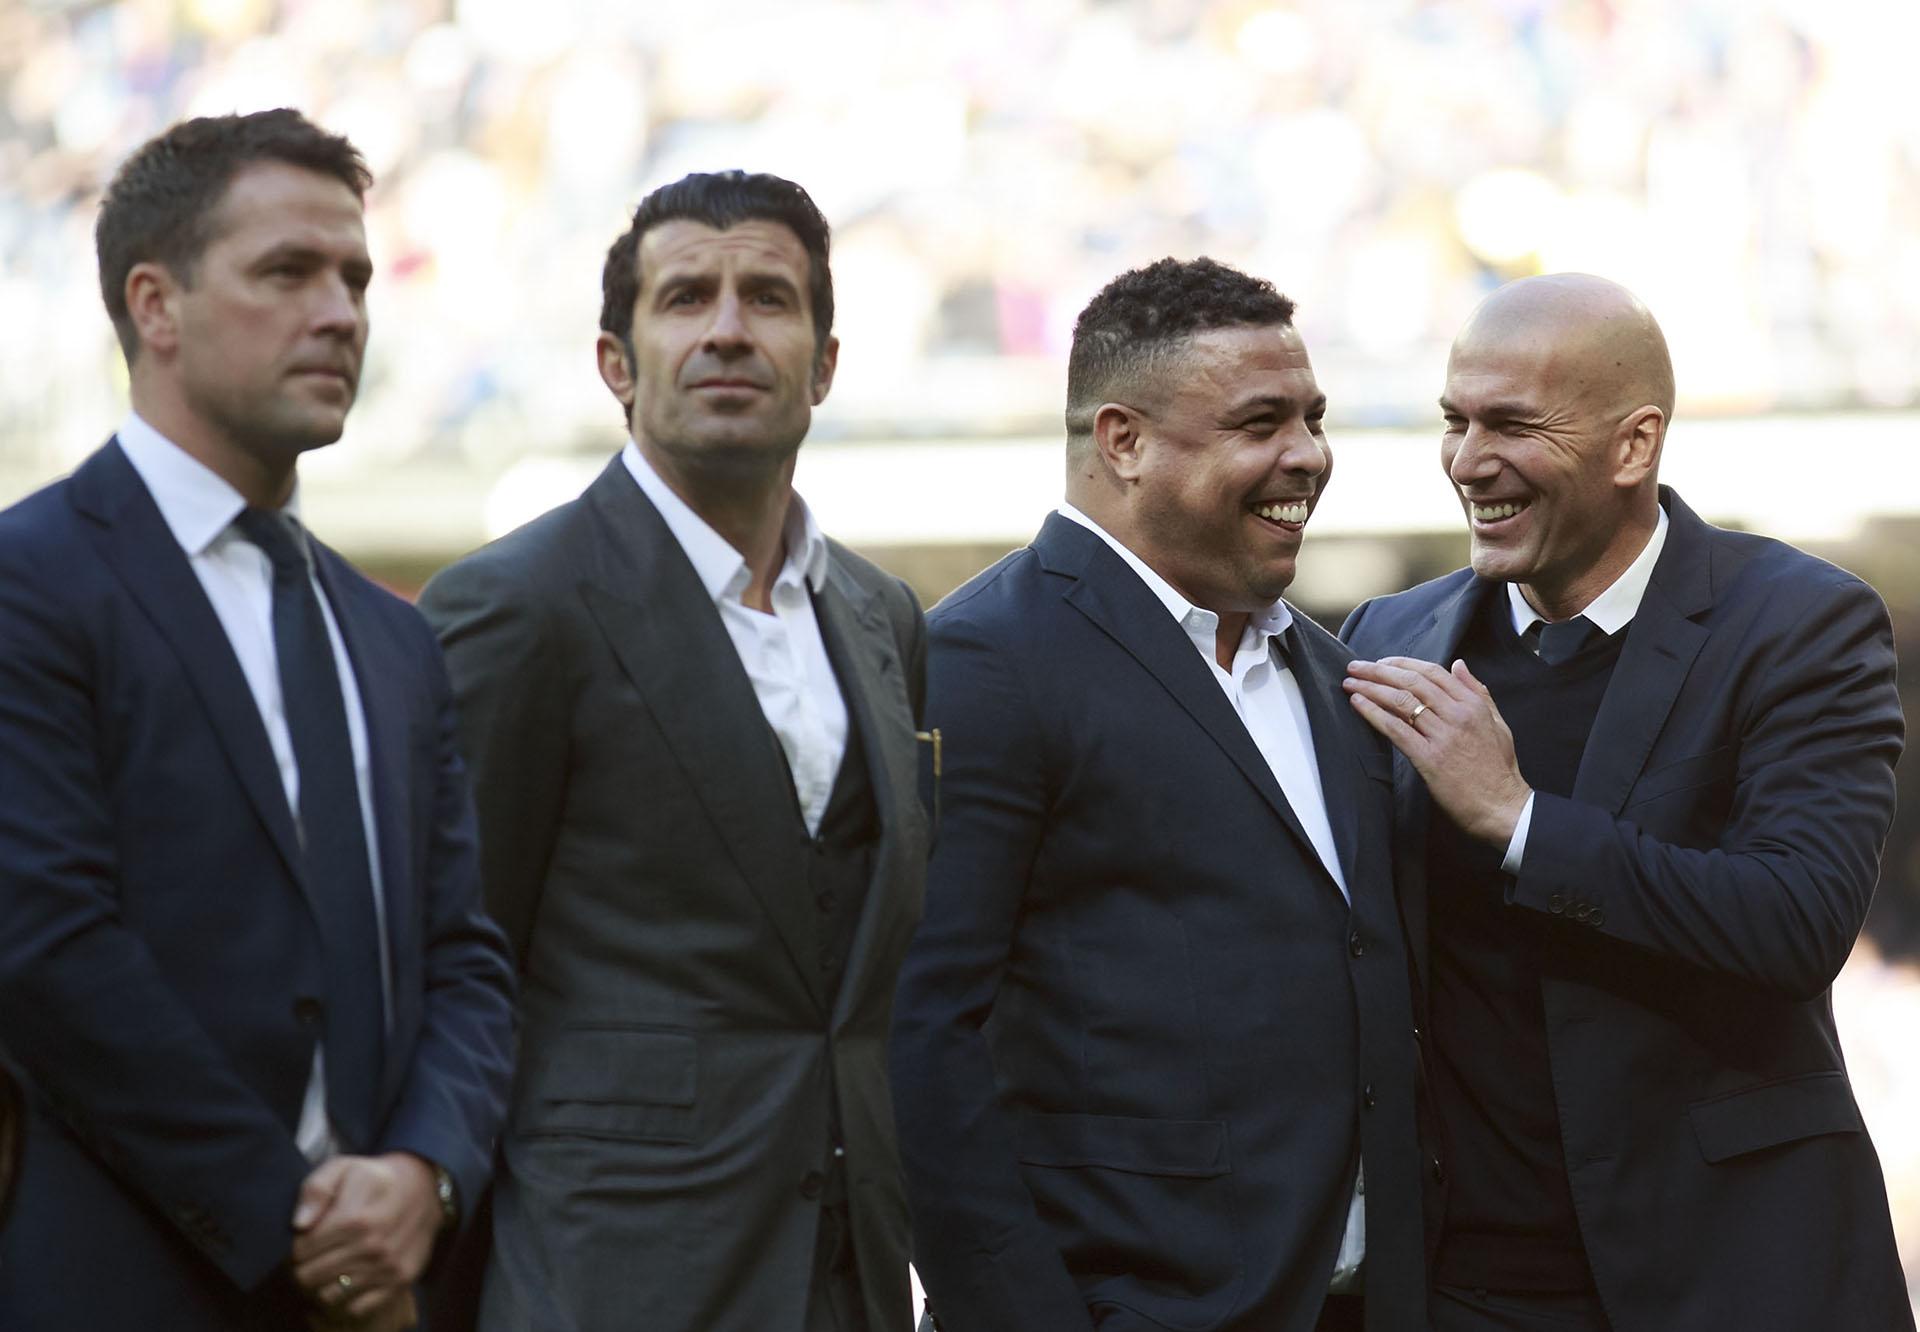 Michael Owen Luis Figo Ronaldo Zinedine Zidane